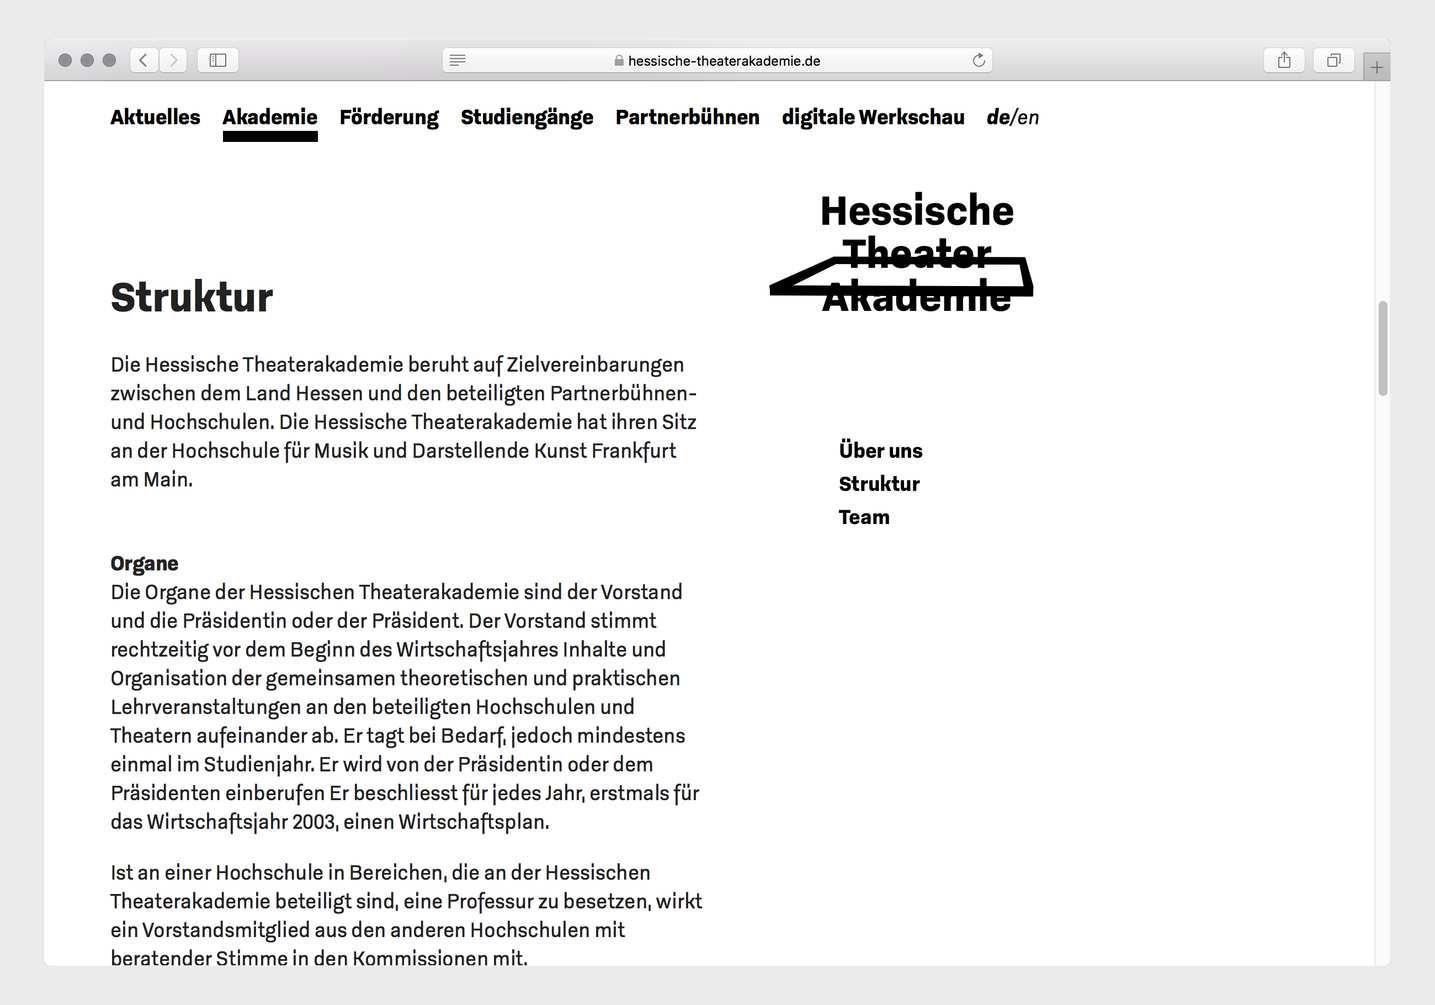 hta-website-4-1435x1004px